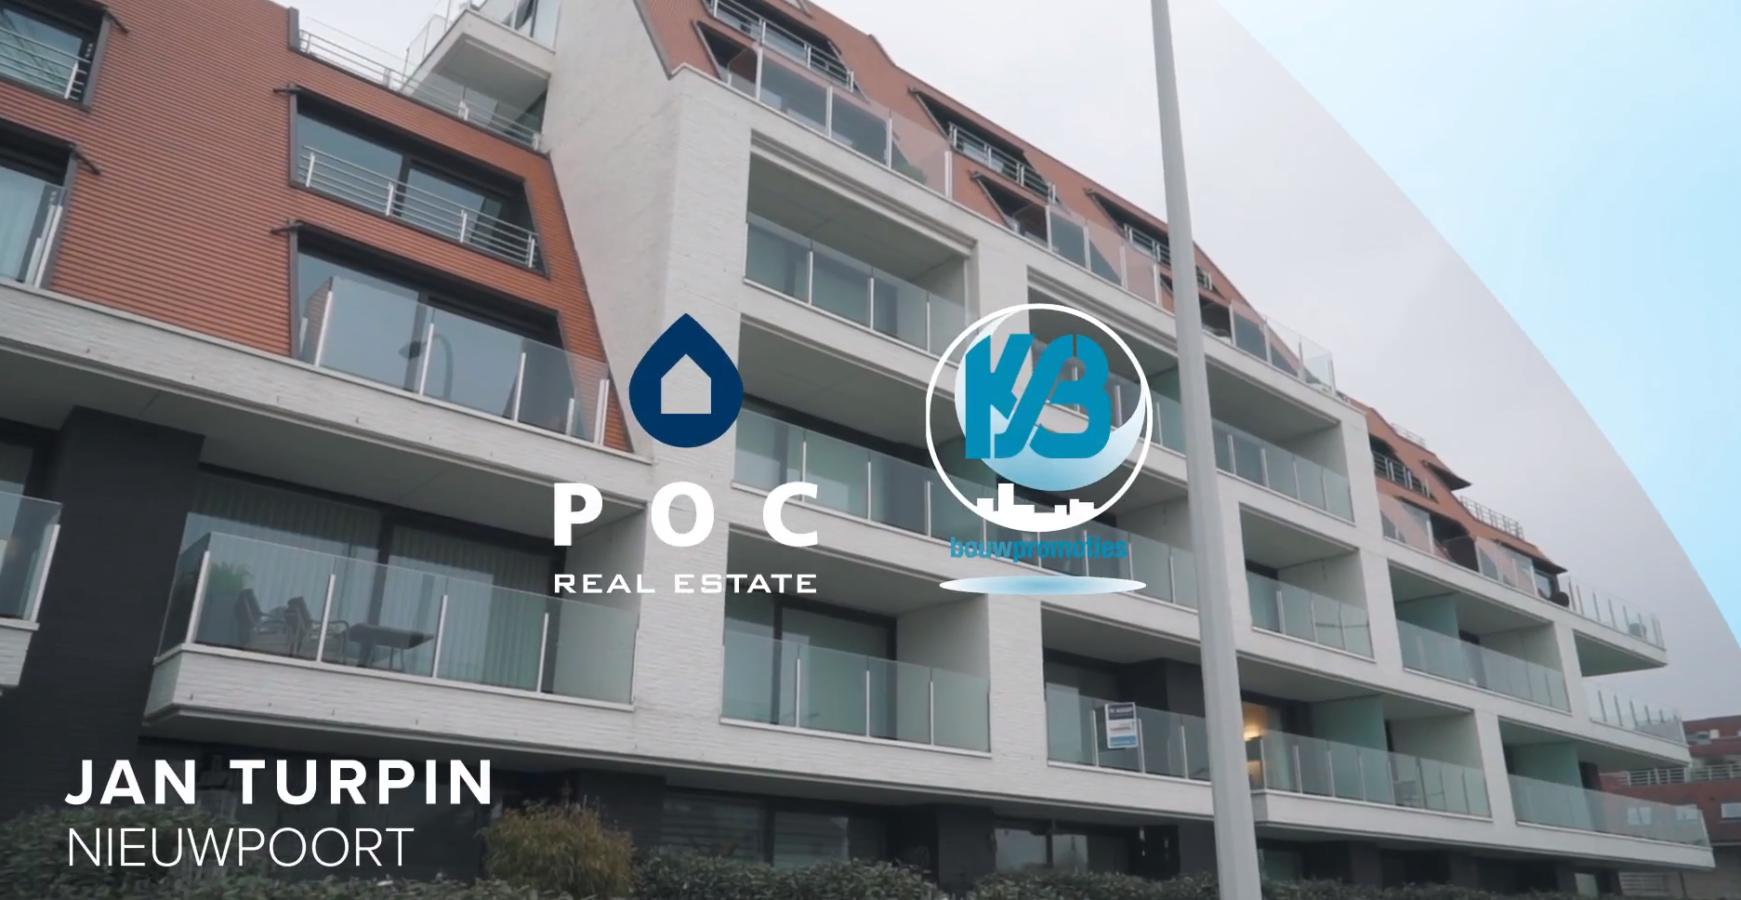 2018-06-12 11_35_46-Jan Turpin_ Fase 3 & 4 ‹ POC Partners